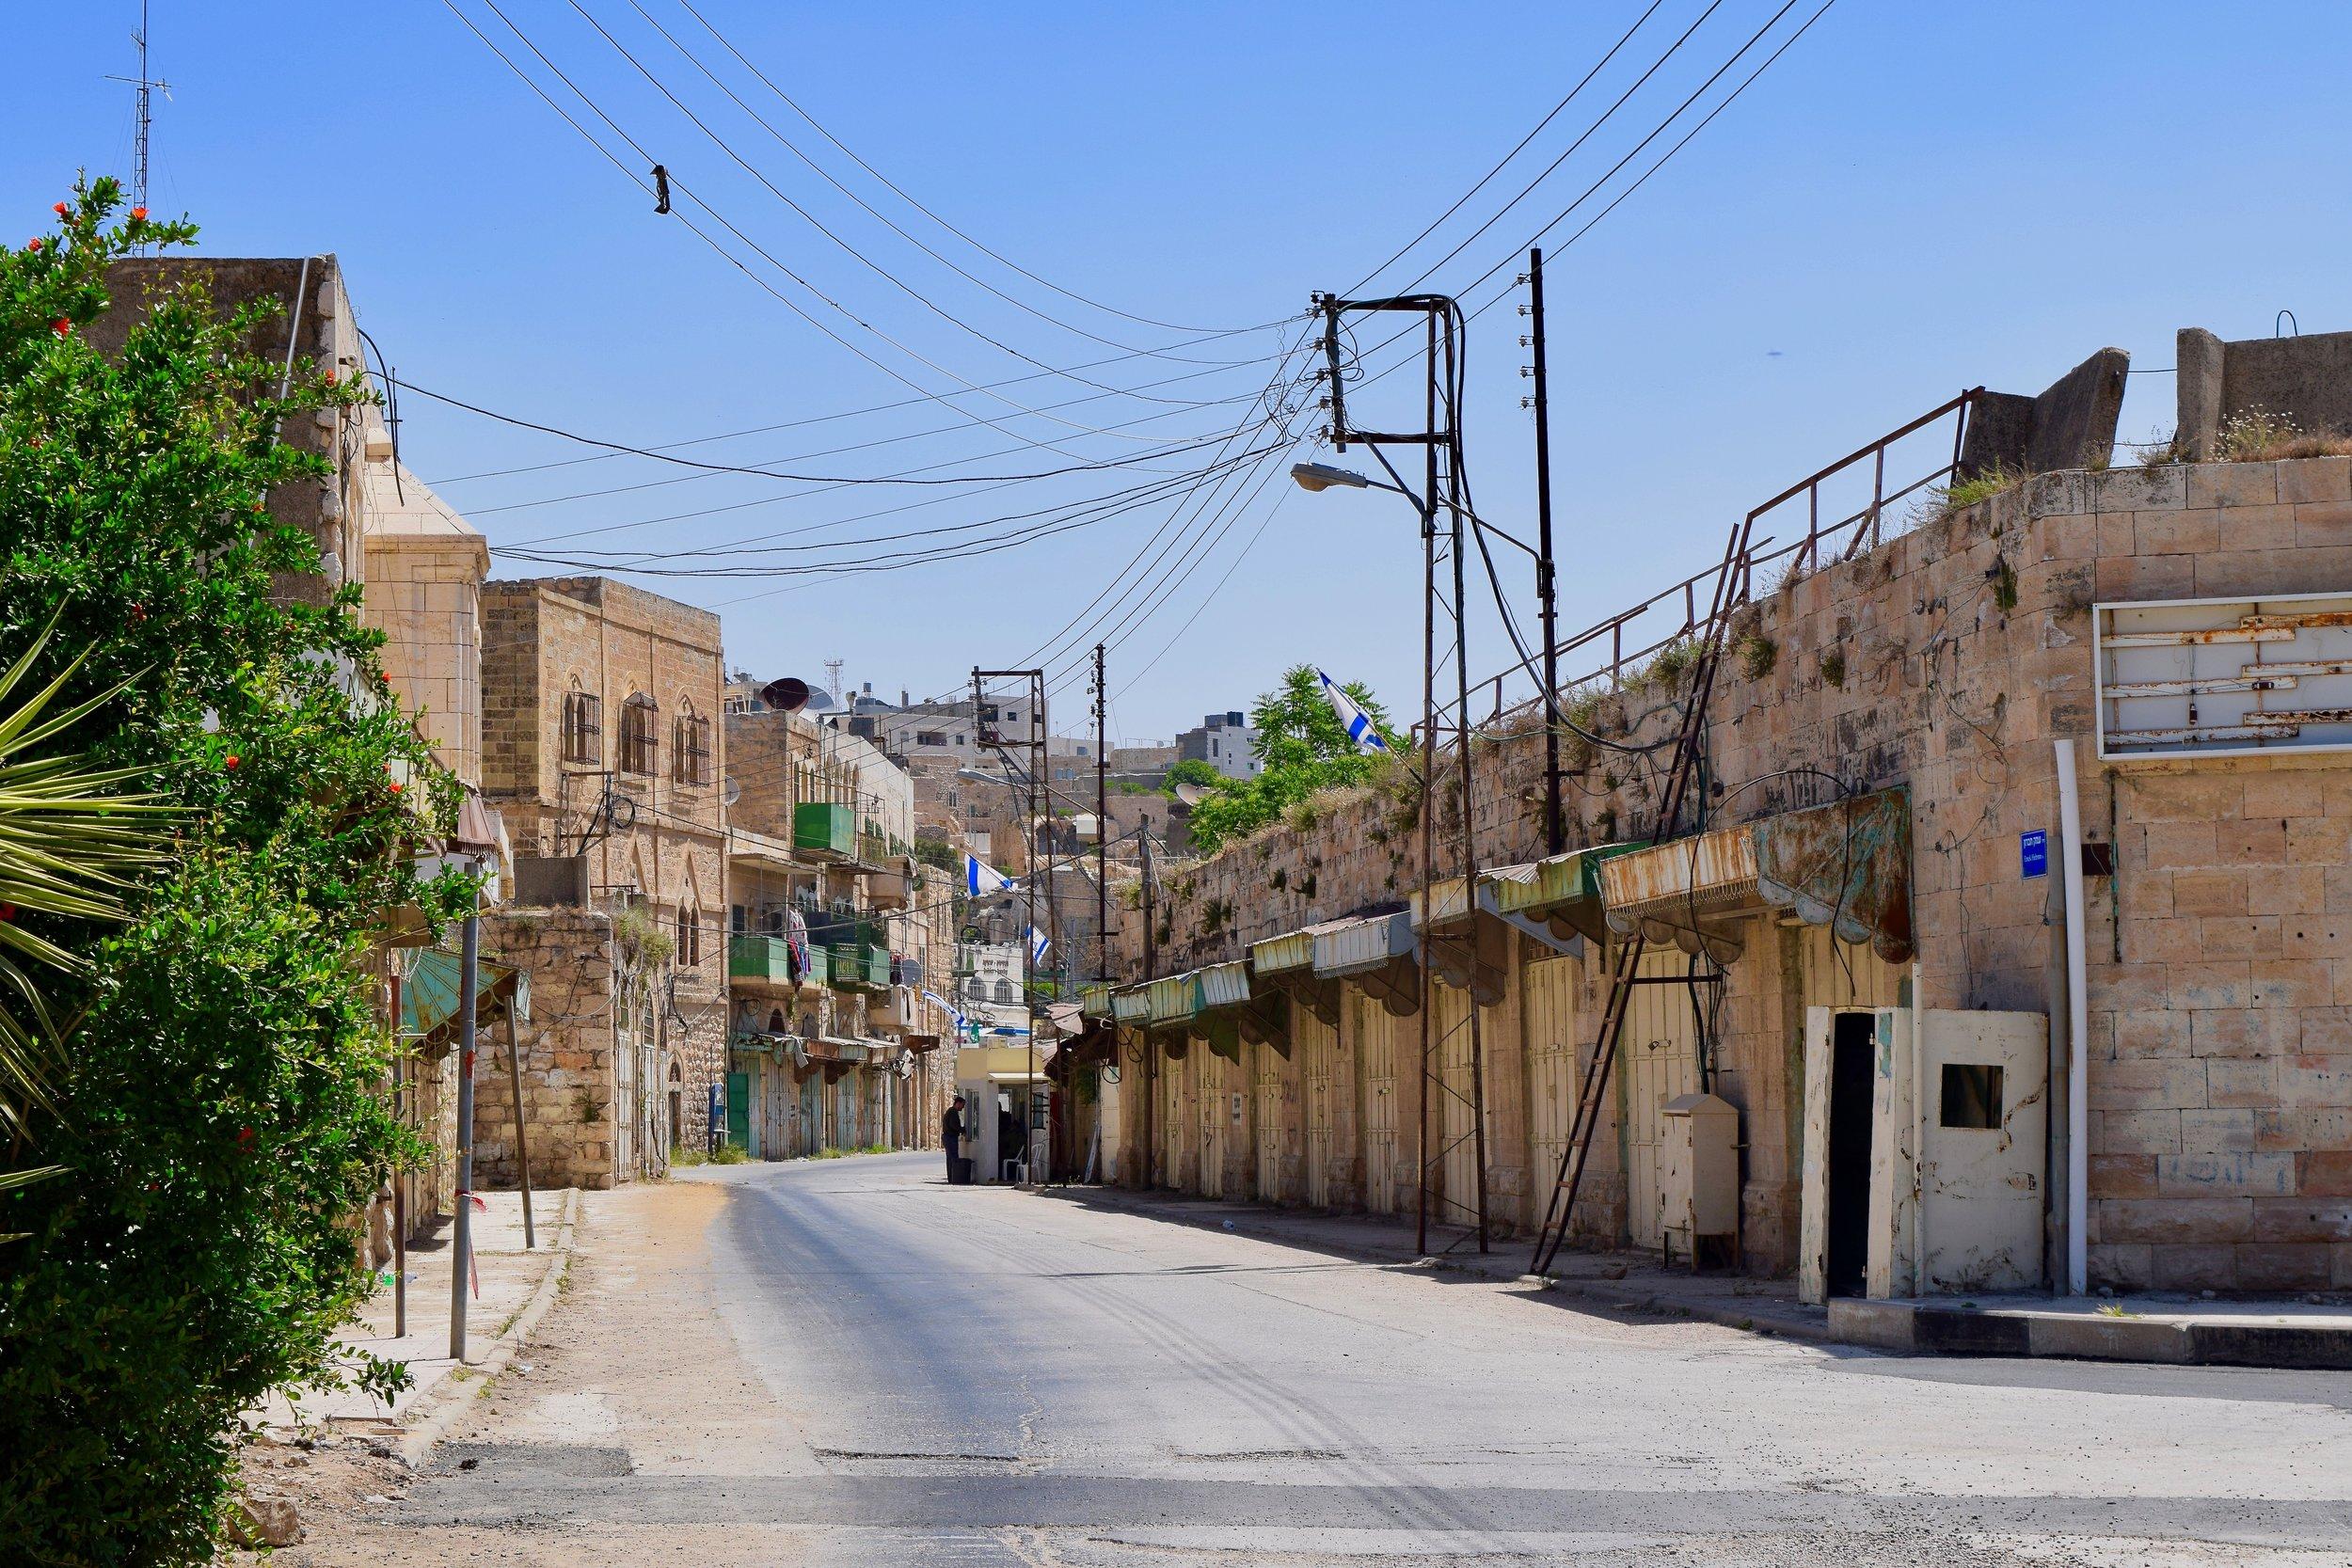 Deserted street in Hebron